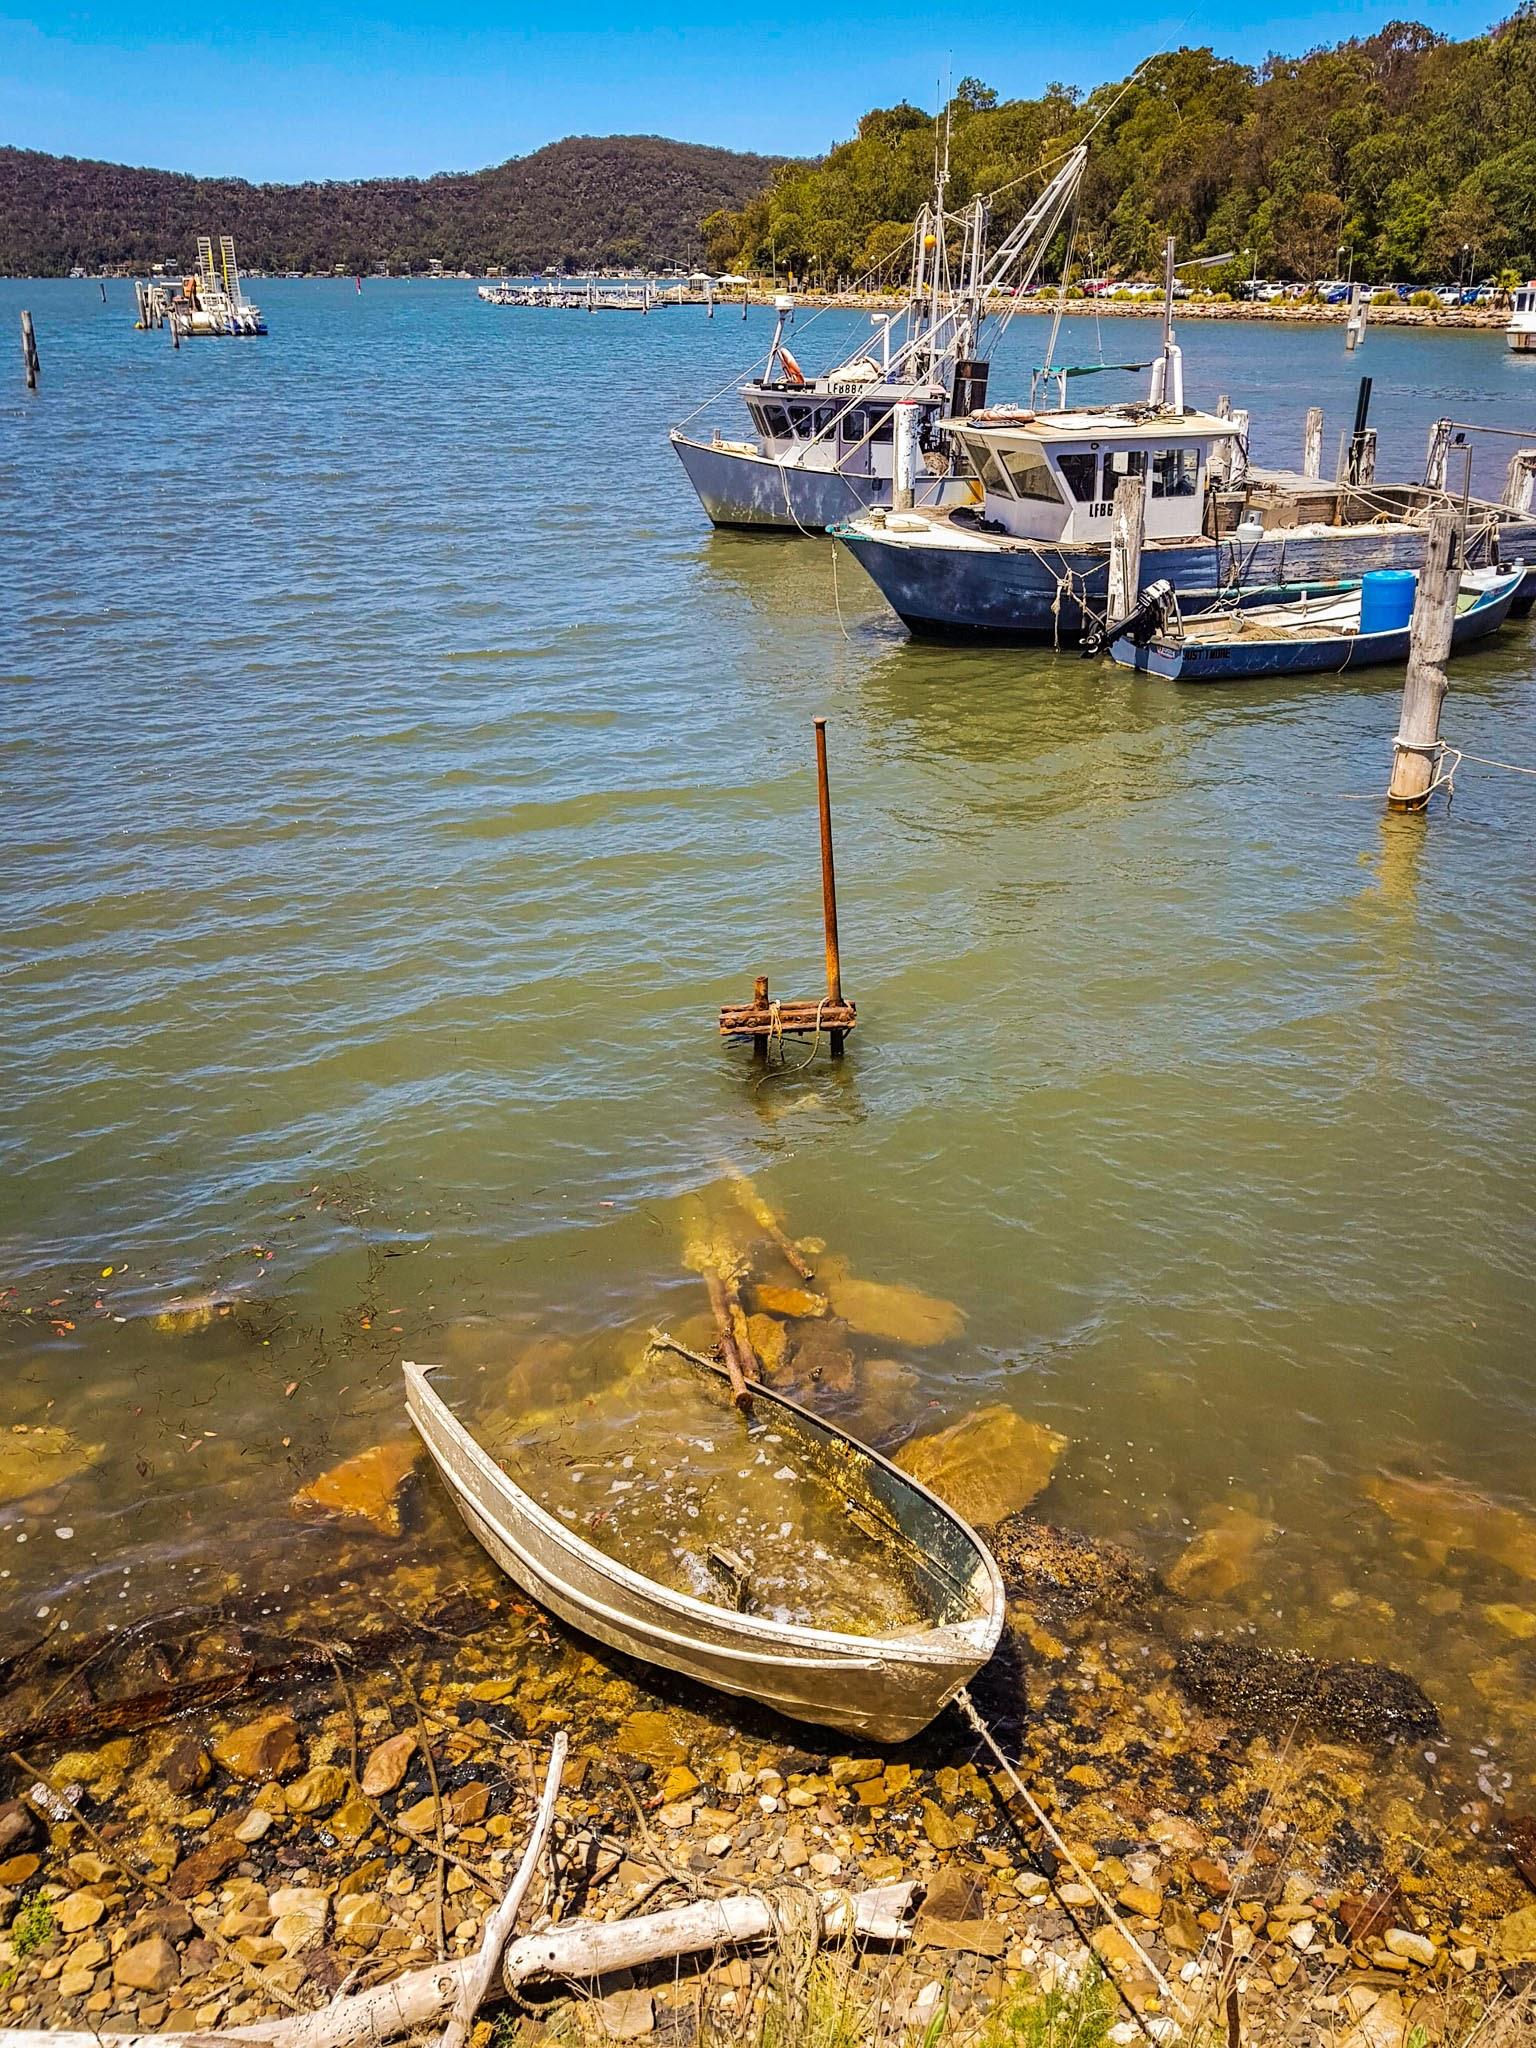 Stranded boat, Brooklyn